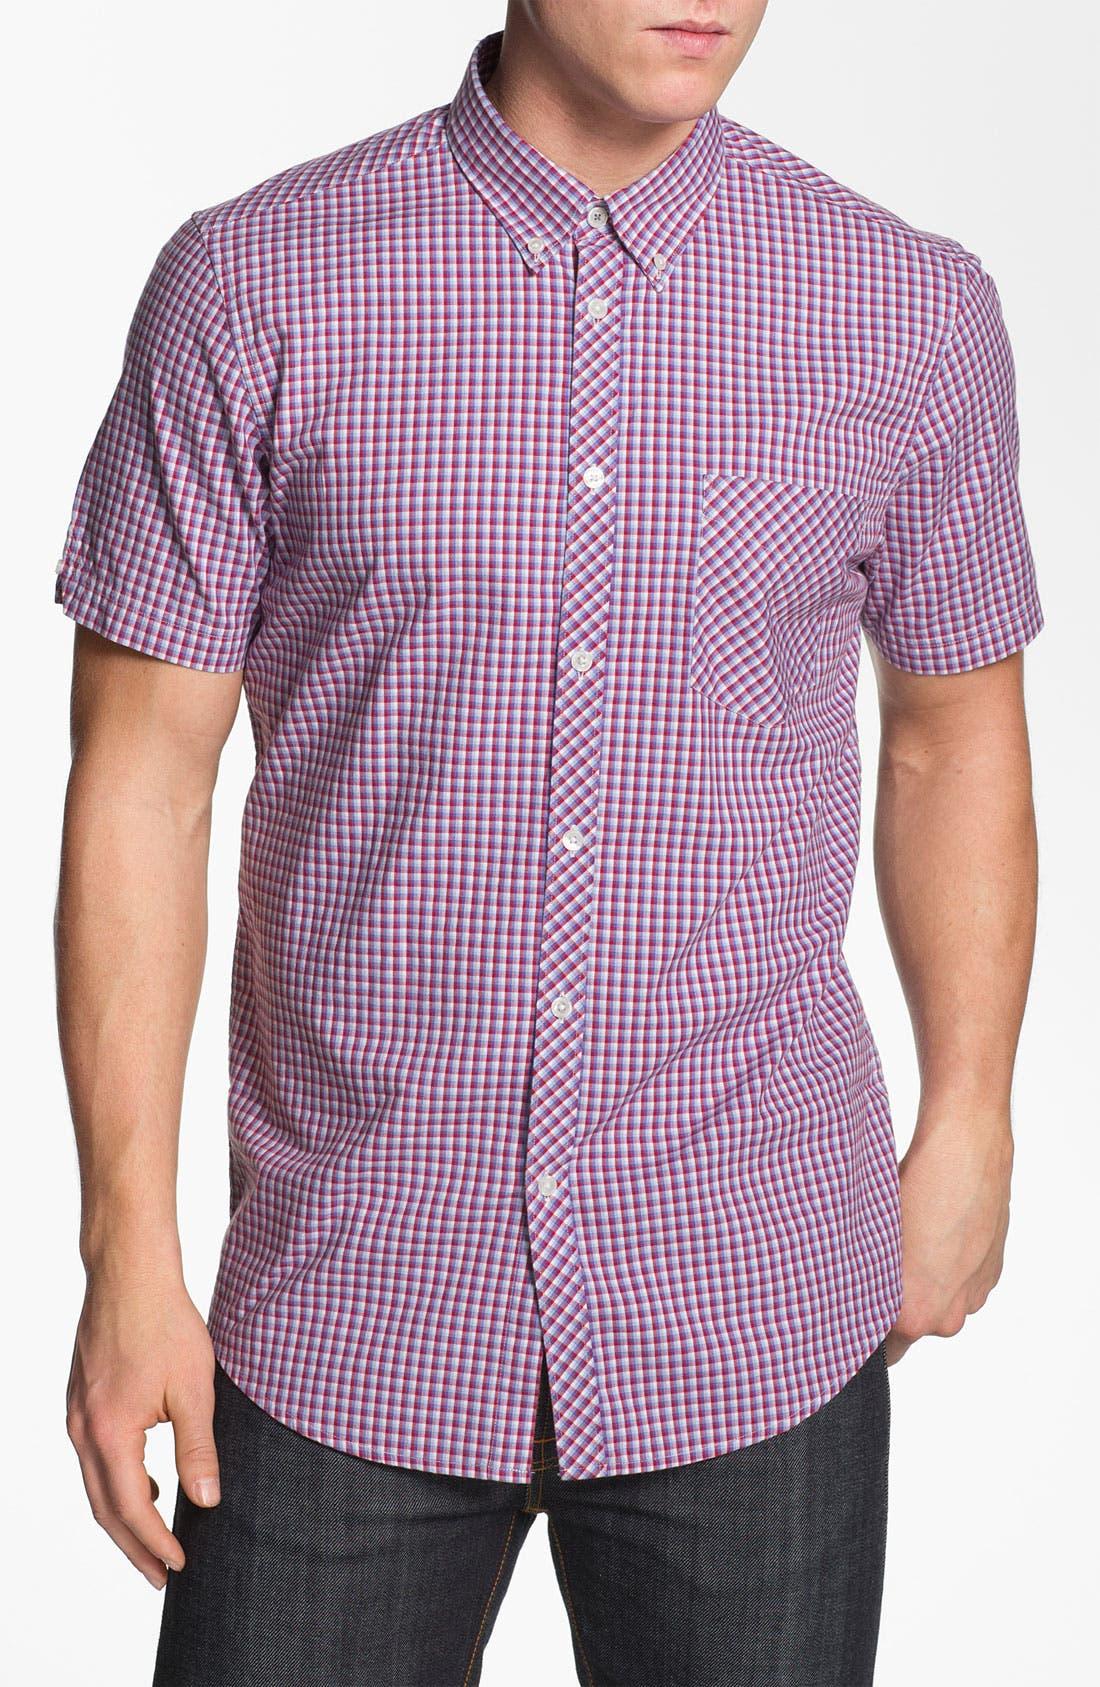 Alternate Image 1 Selected - Ben Sherman Short Sleeve Woven Shirt